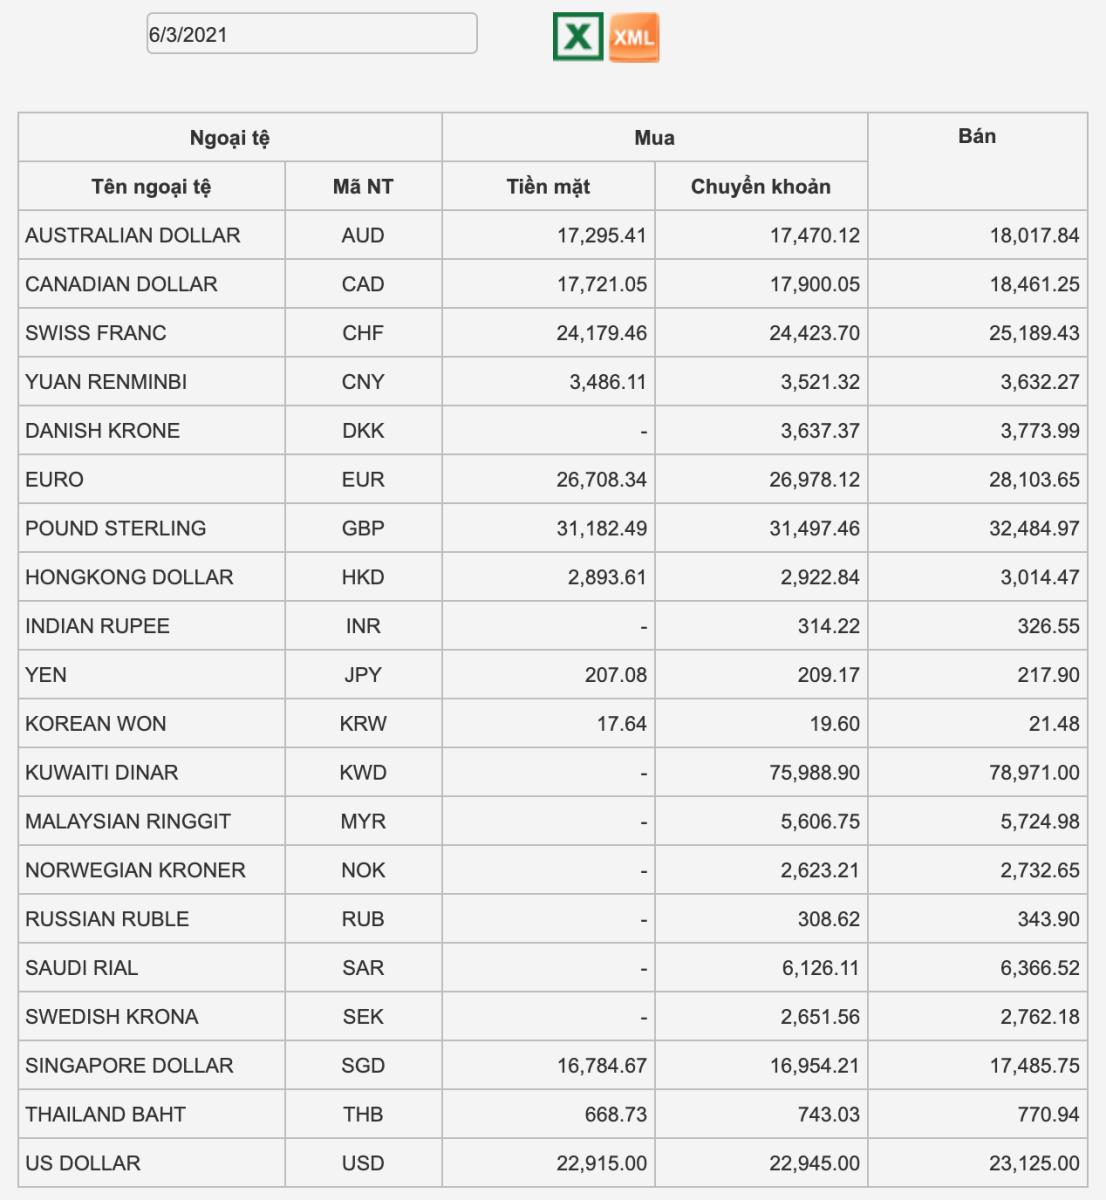 Tỷ giá Vietcombank hôm nay 6/3: USD neo ở mức cao